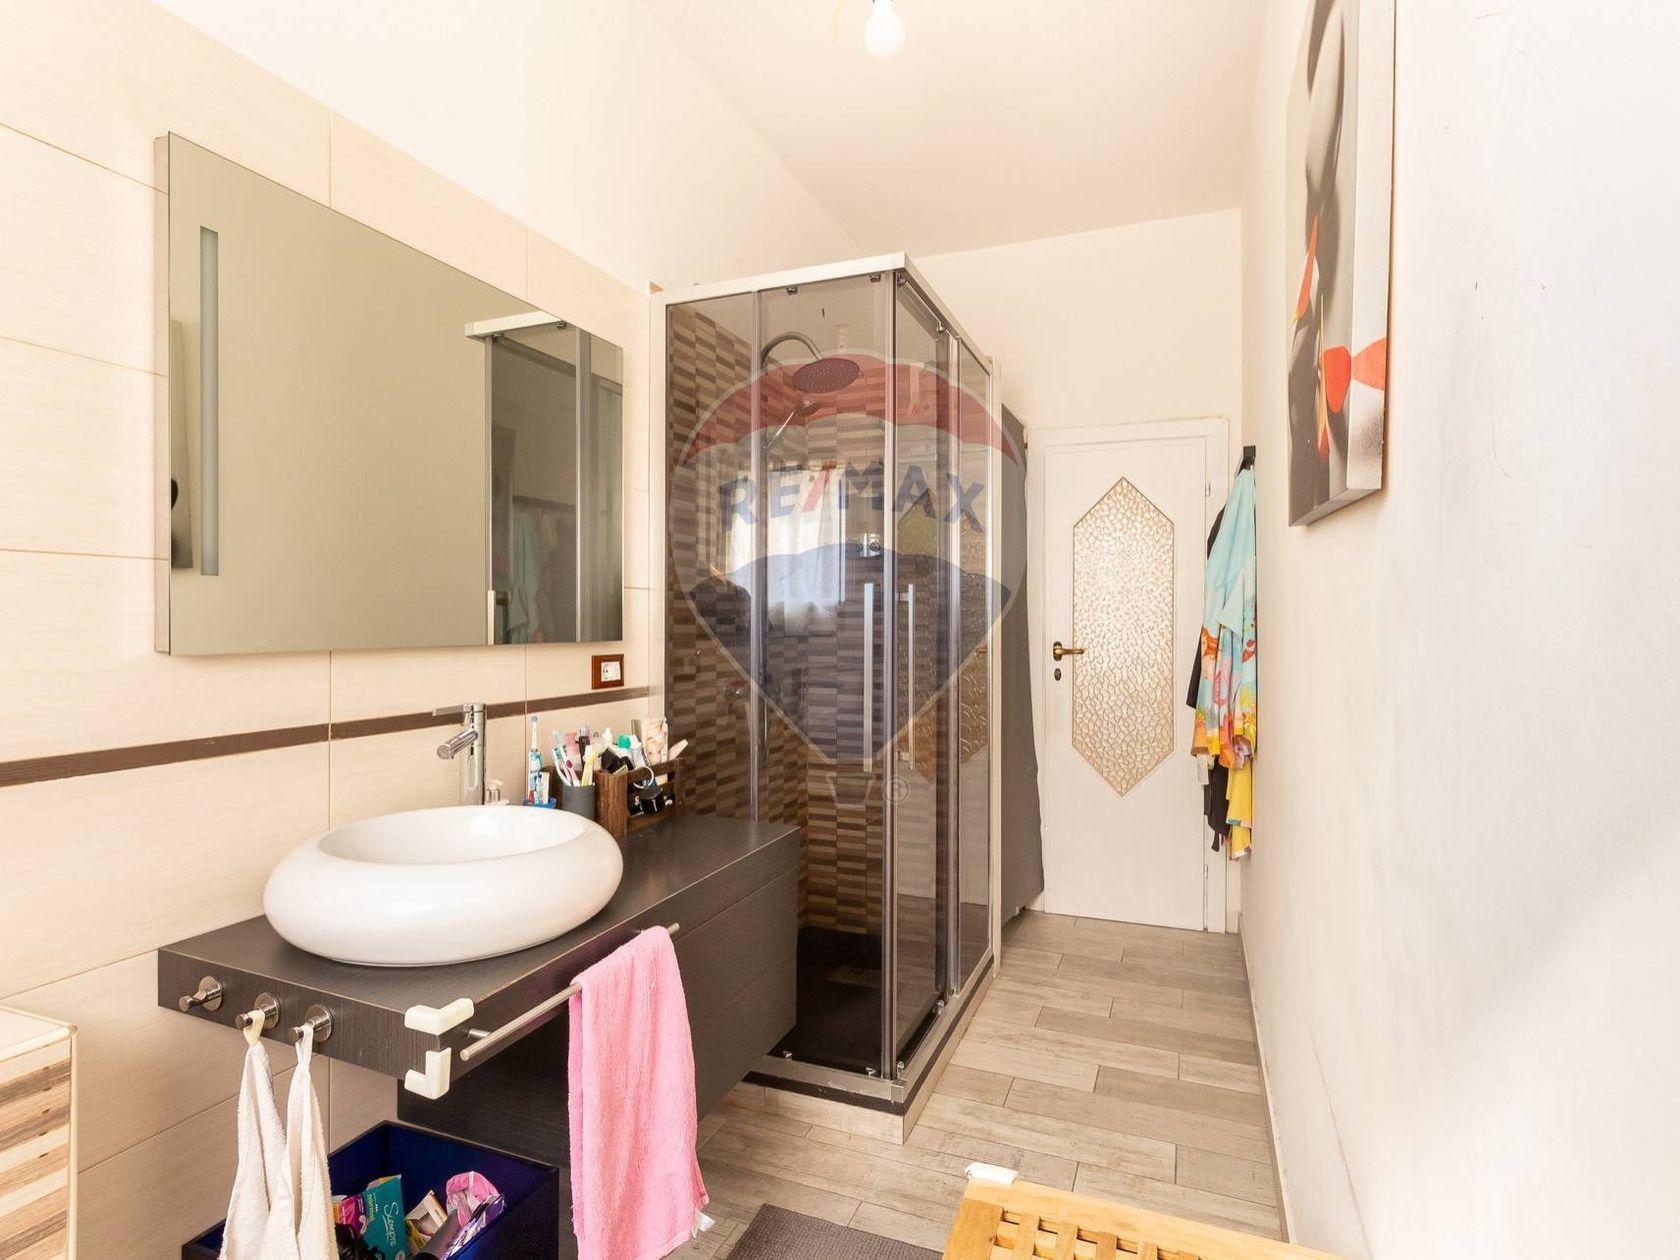 Appartamento Milano-certosa Quarto Oggiaro Villapizzone, Milano, MI Vendita - Foto 7